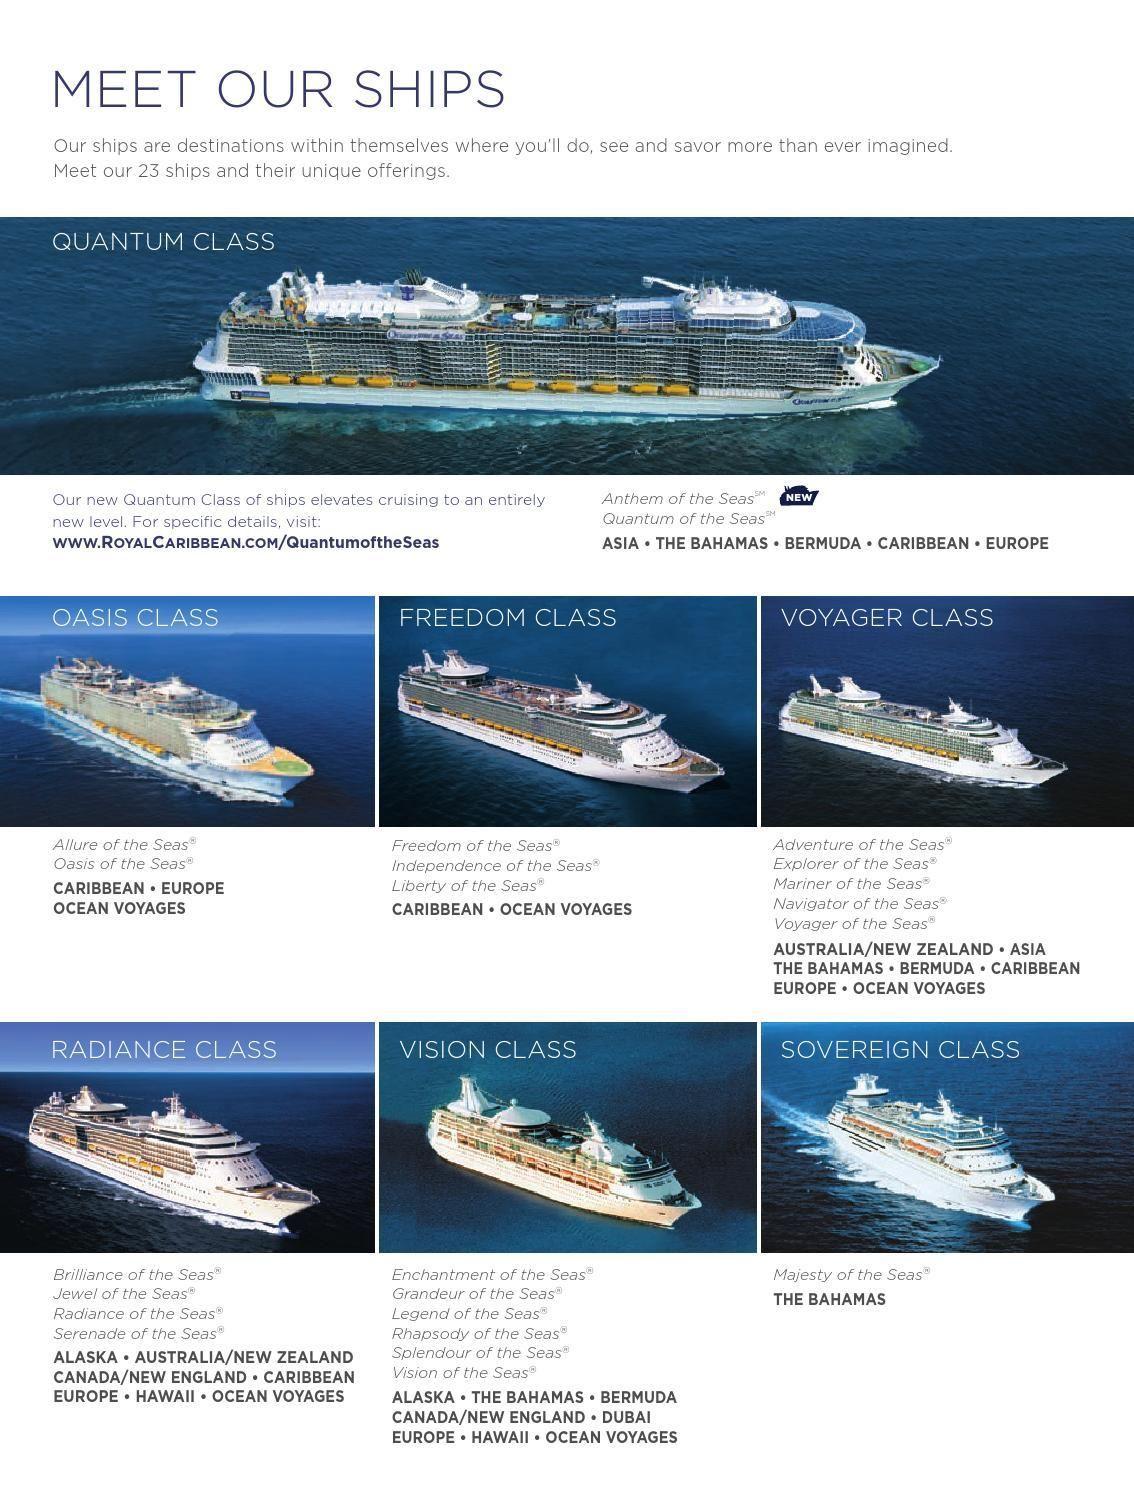 Royal Caribbean 2015 2016 Cruises Royal Caribbean Cruise Lines Royal Caribbean Ships Royal Caribbean Cruise